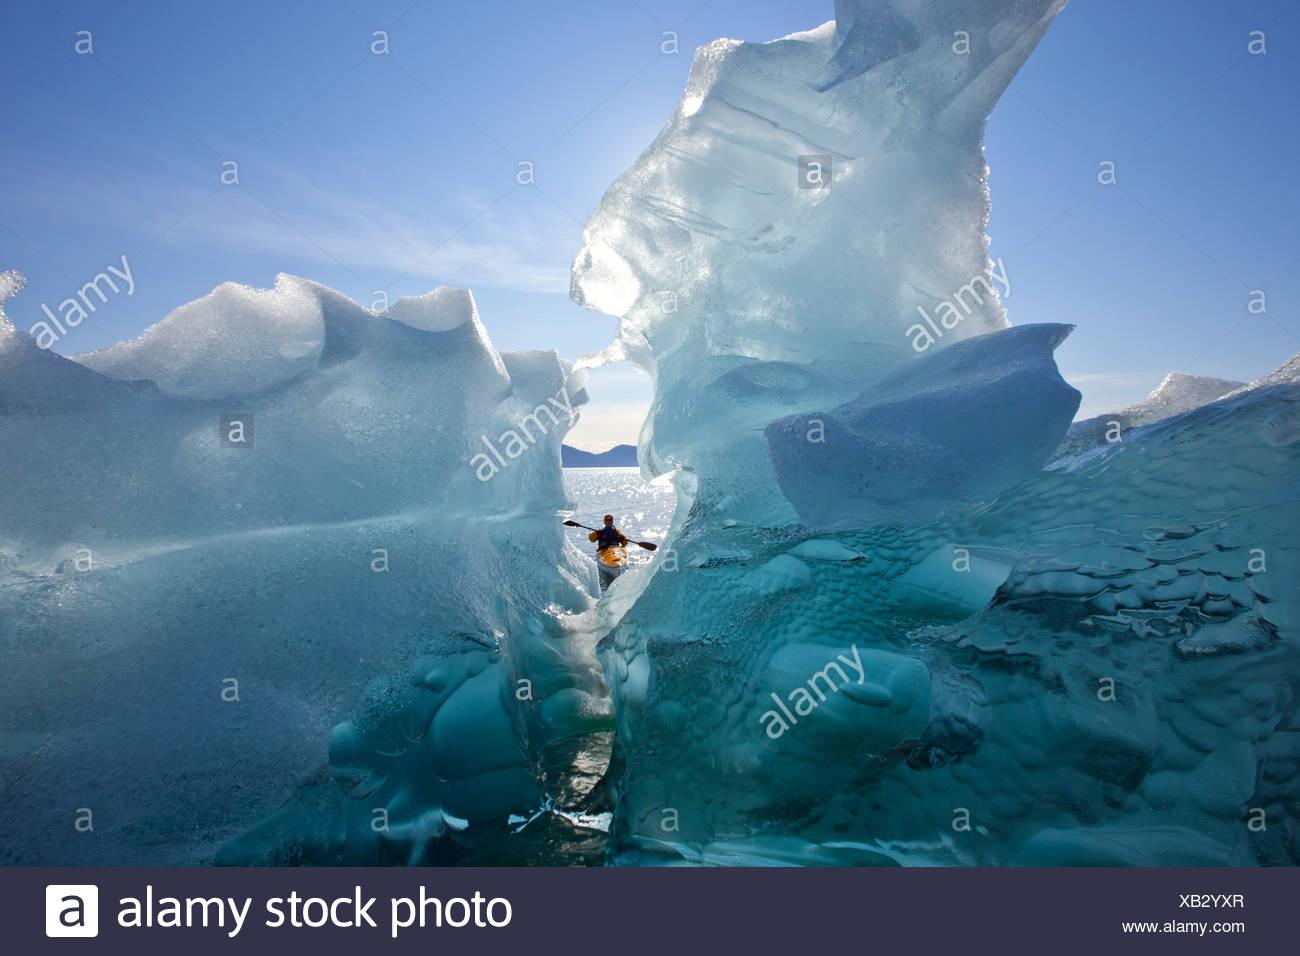 Mar Kayakista opiniones grandes icebergs en Stephens pasaje, Tracy Arm-Fords Terror Desierto, dentro del pasaje, Alaska Imagen De Stock